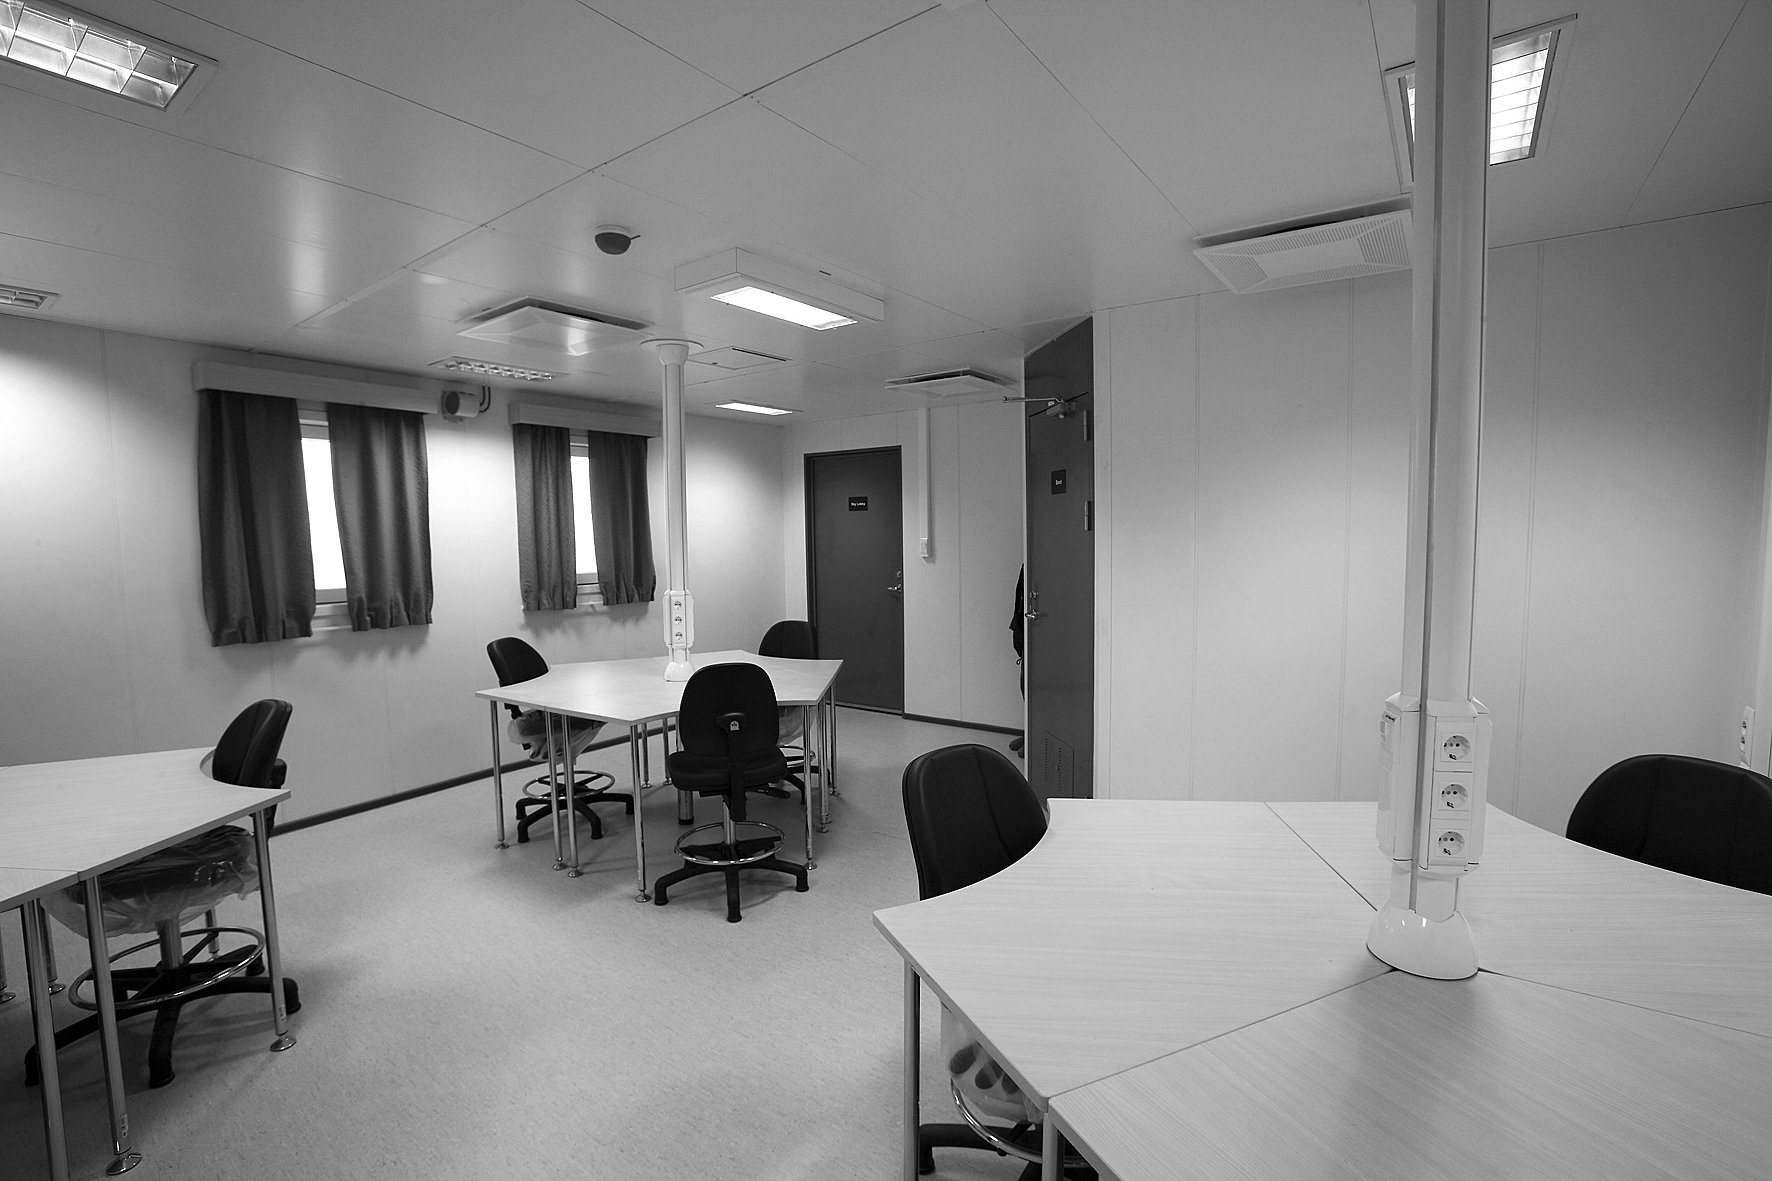 1-Panel-doors-ceiling-and-flooring-ZW